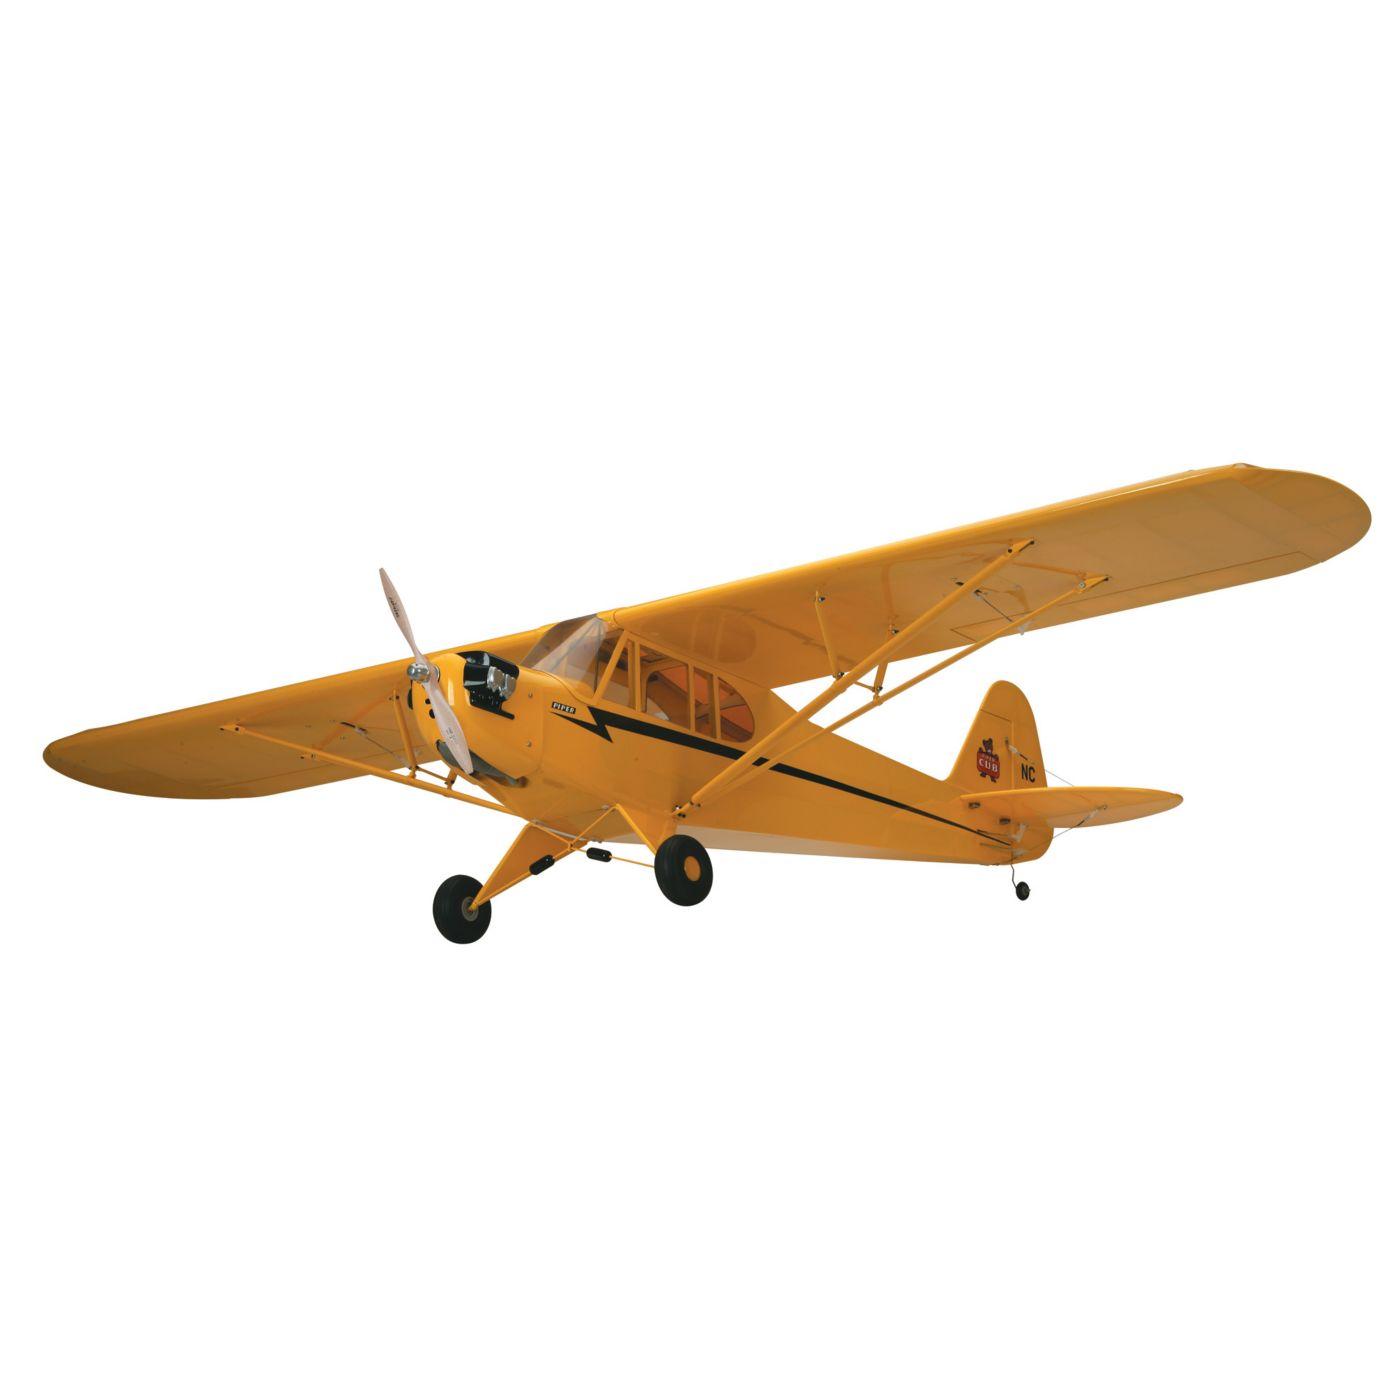 Hangar-9 Piper J-3 Cub 40 ARF Airplane | Horizon Hobby